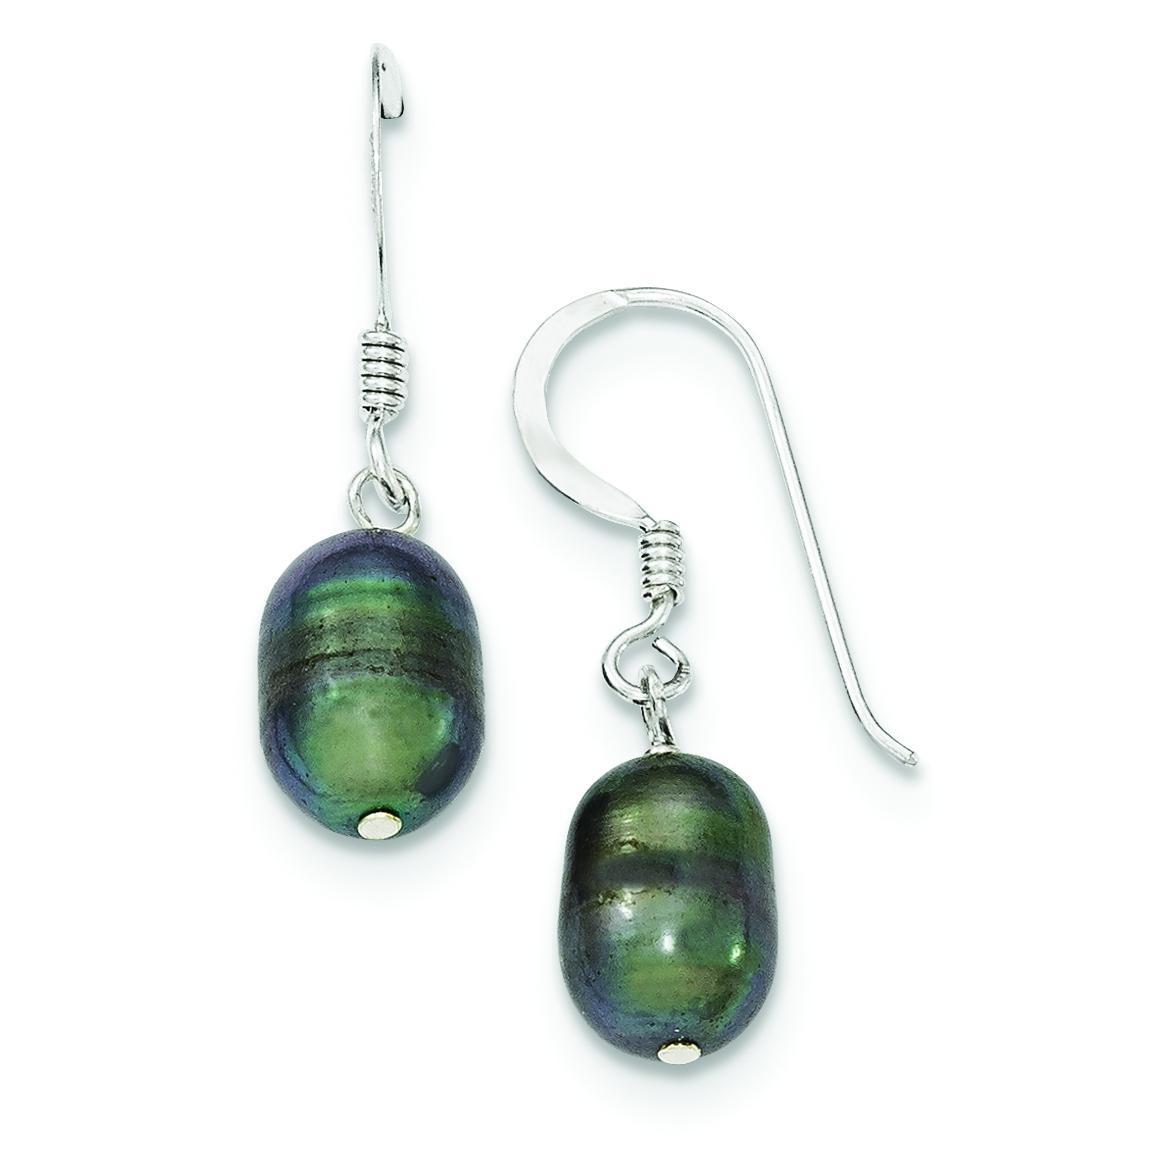 Peacock Freshwater Cultured Pearl Earrings in Sterling Silver